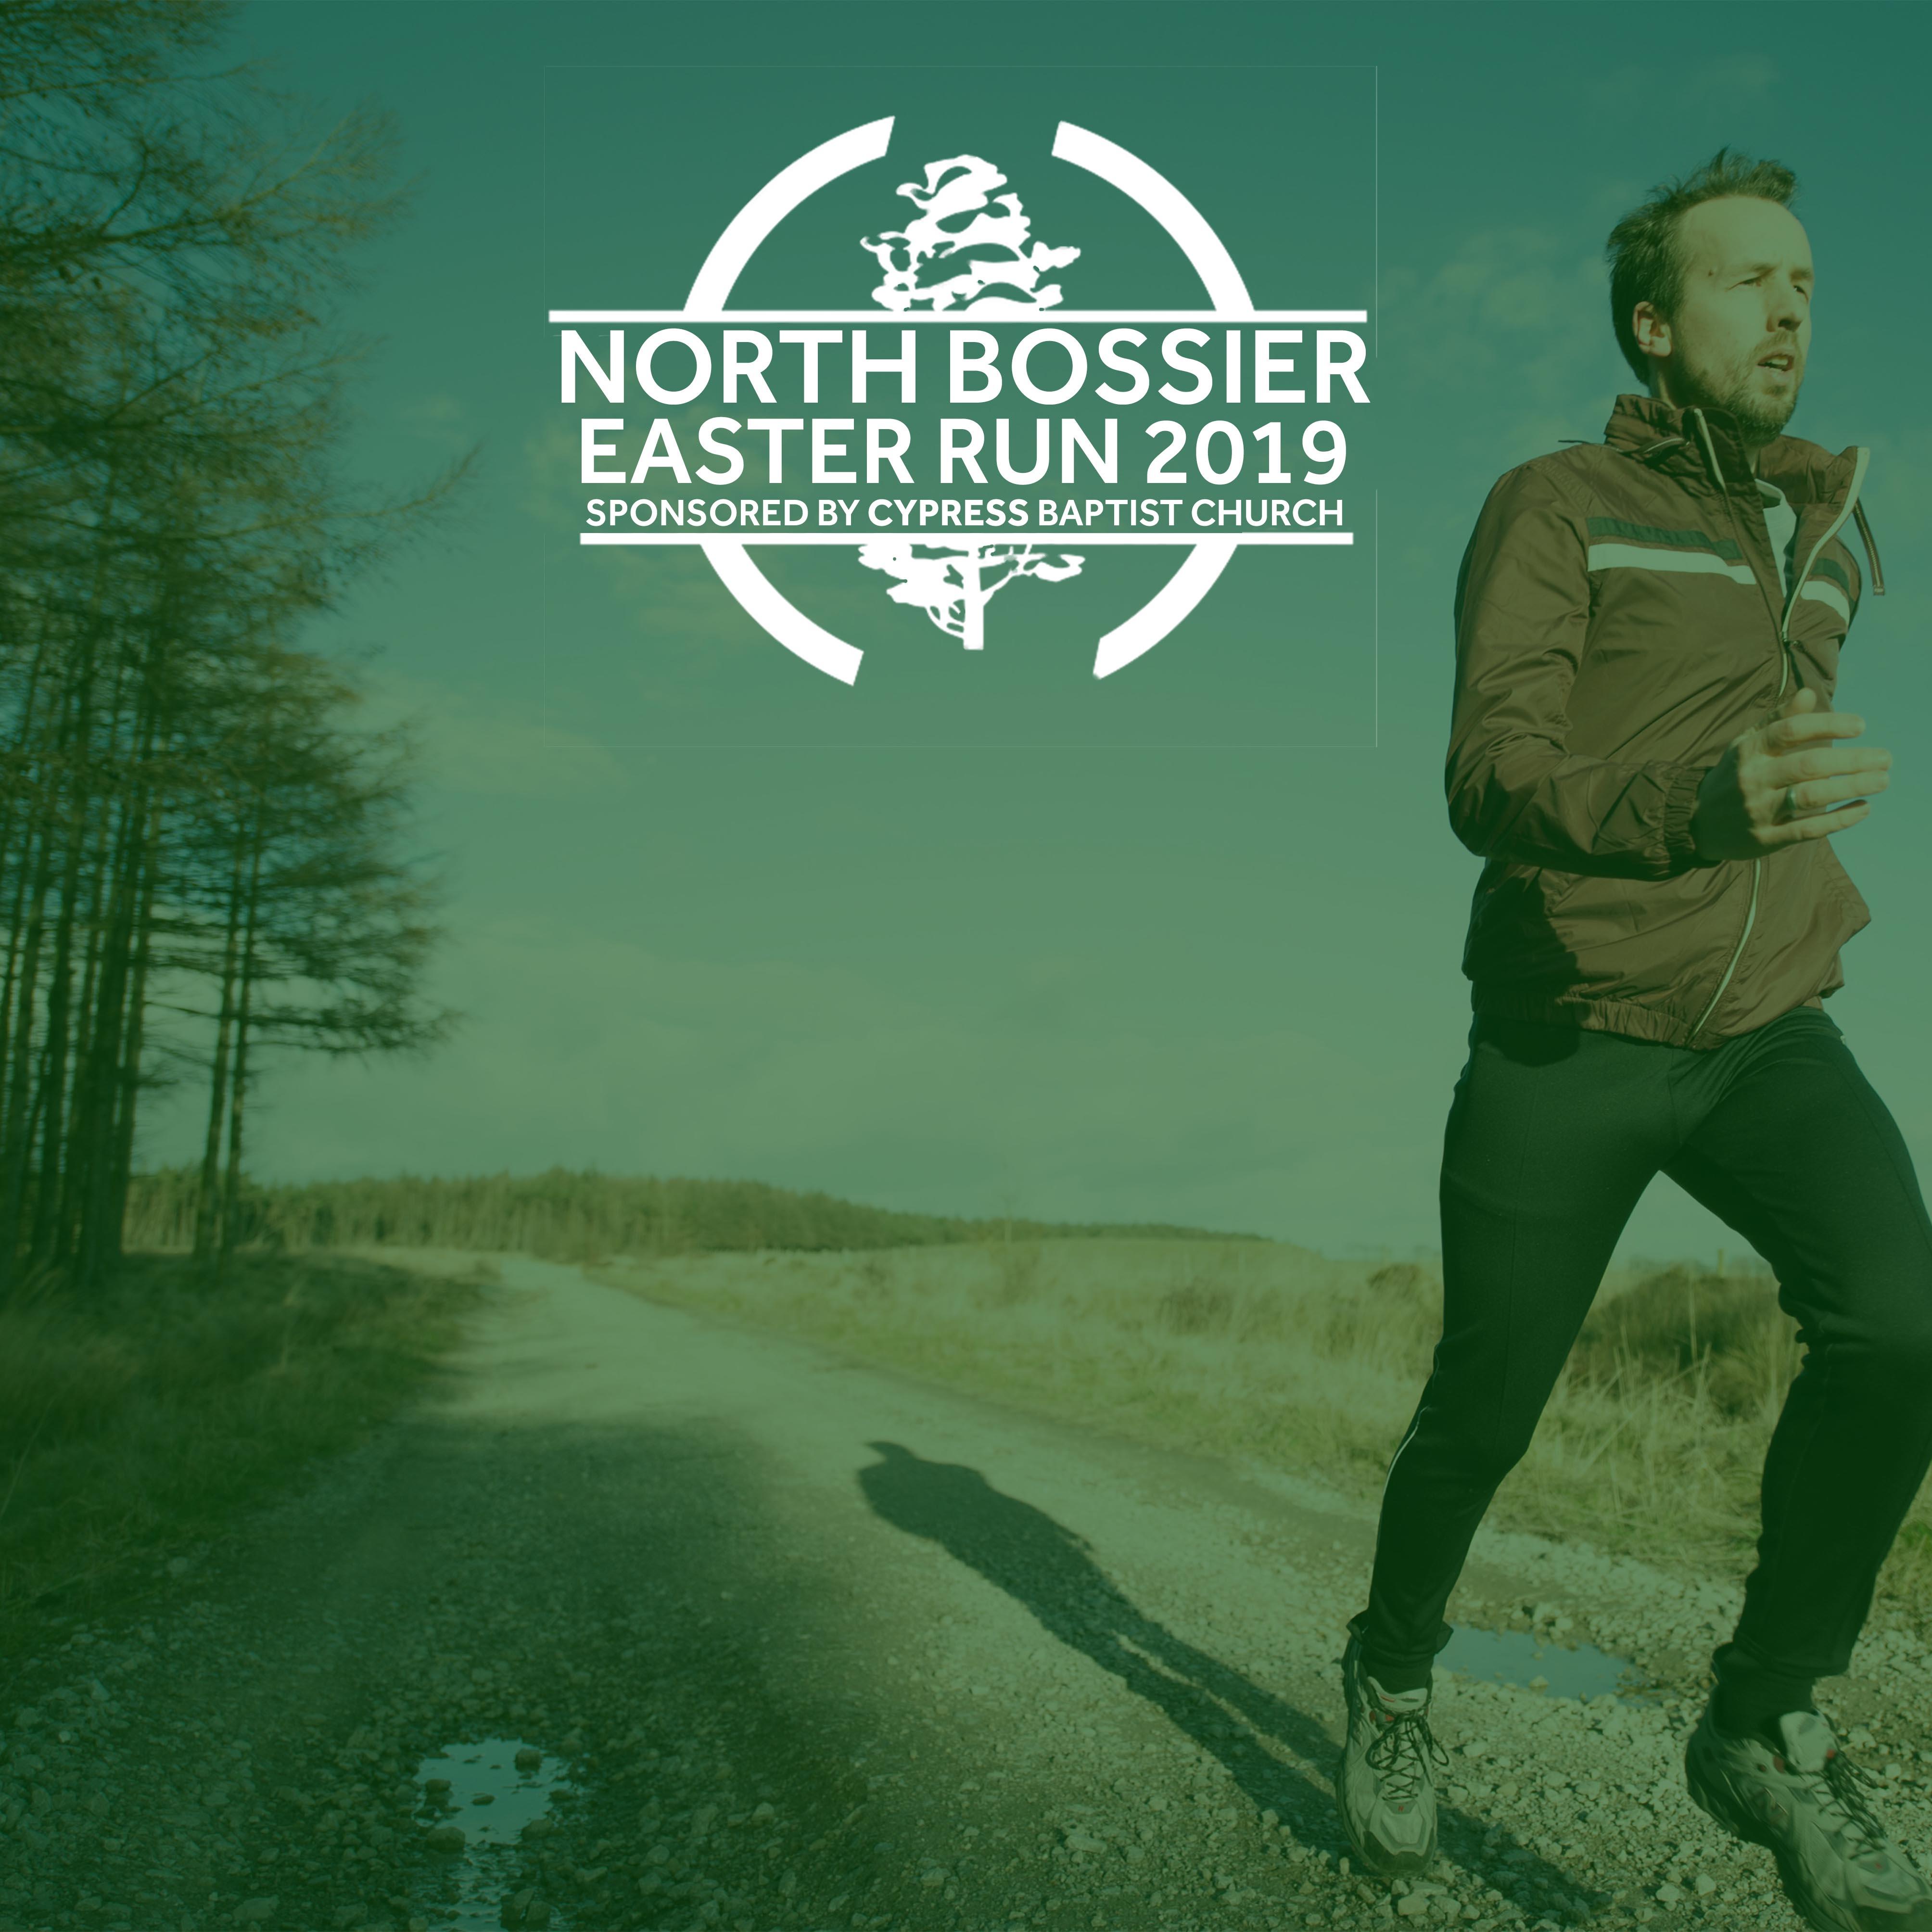 2019 North Bossier Easter Run Sponsored by Cypress Baptist Church